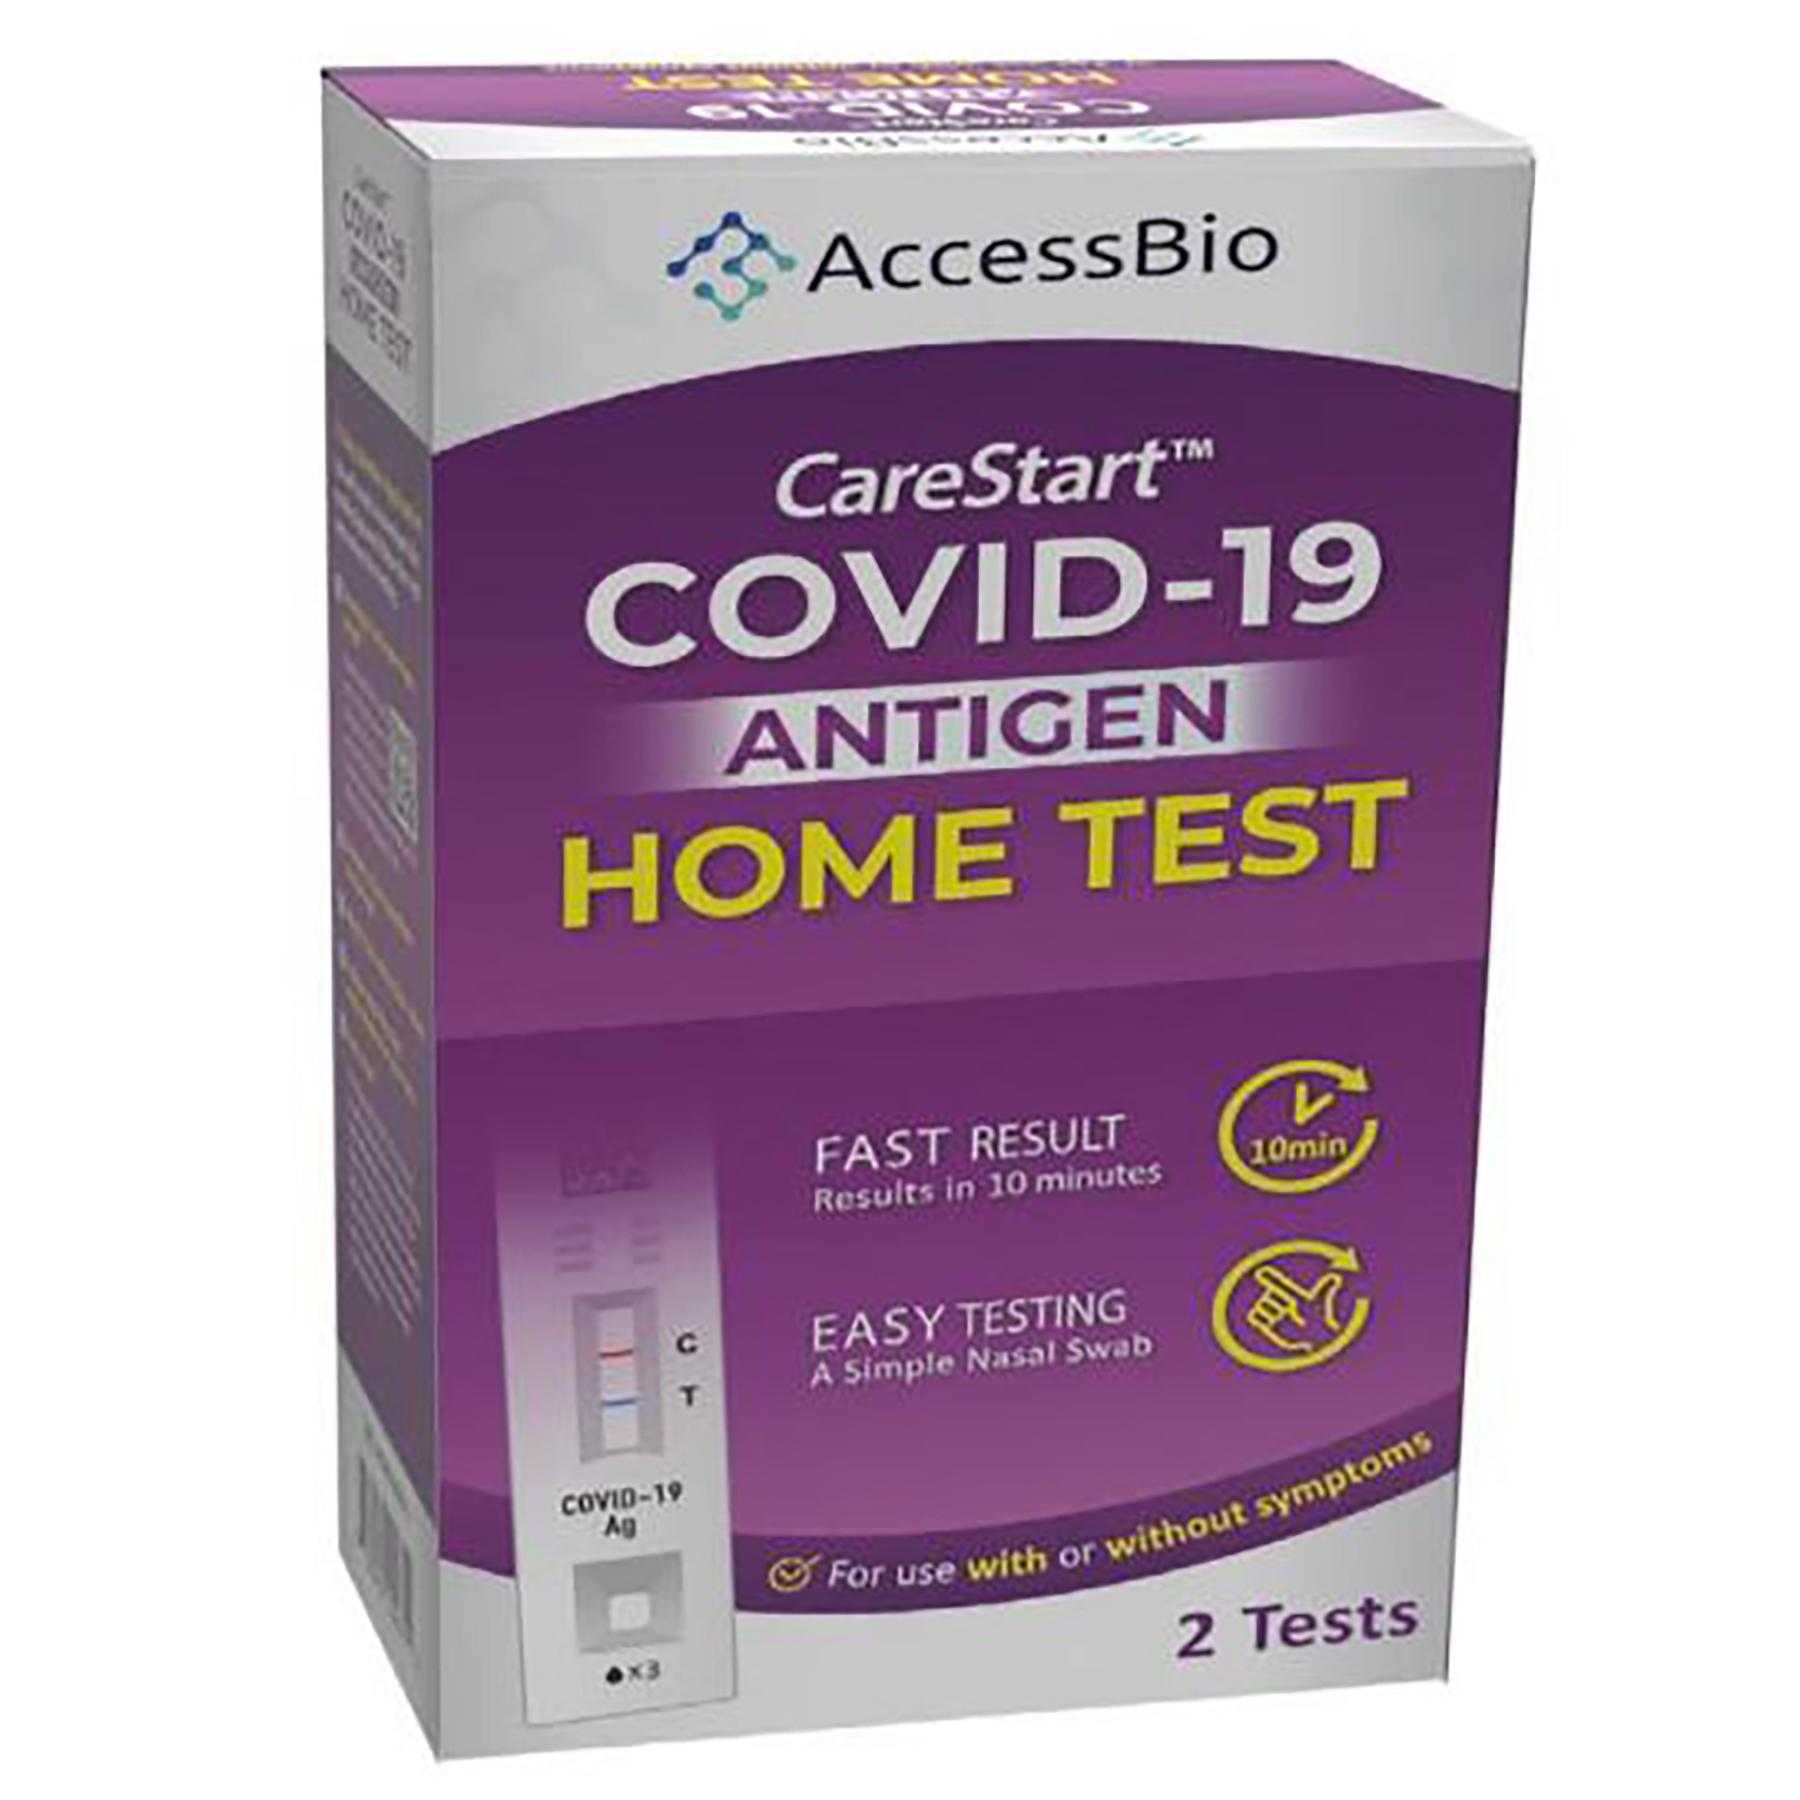 CareStart Rapid Covid Test